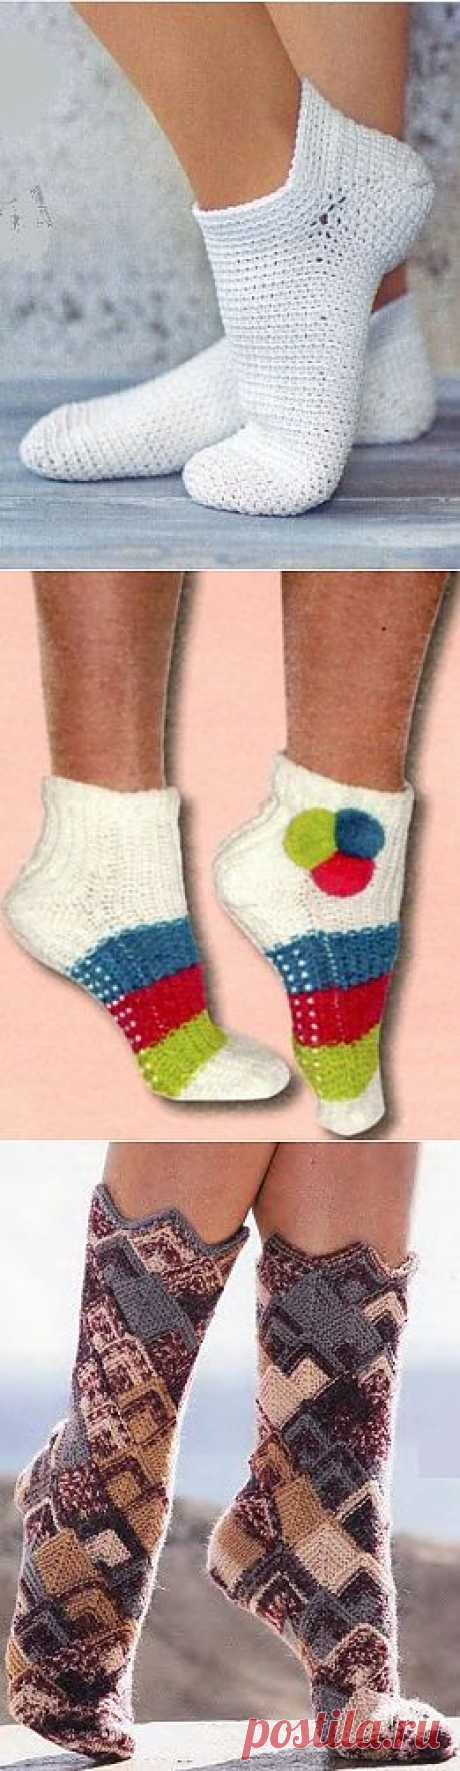 Вязаные носки. Носочки крючком